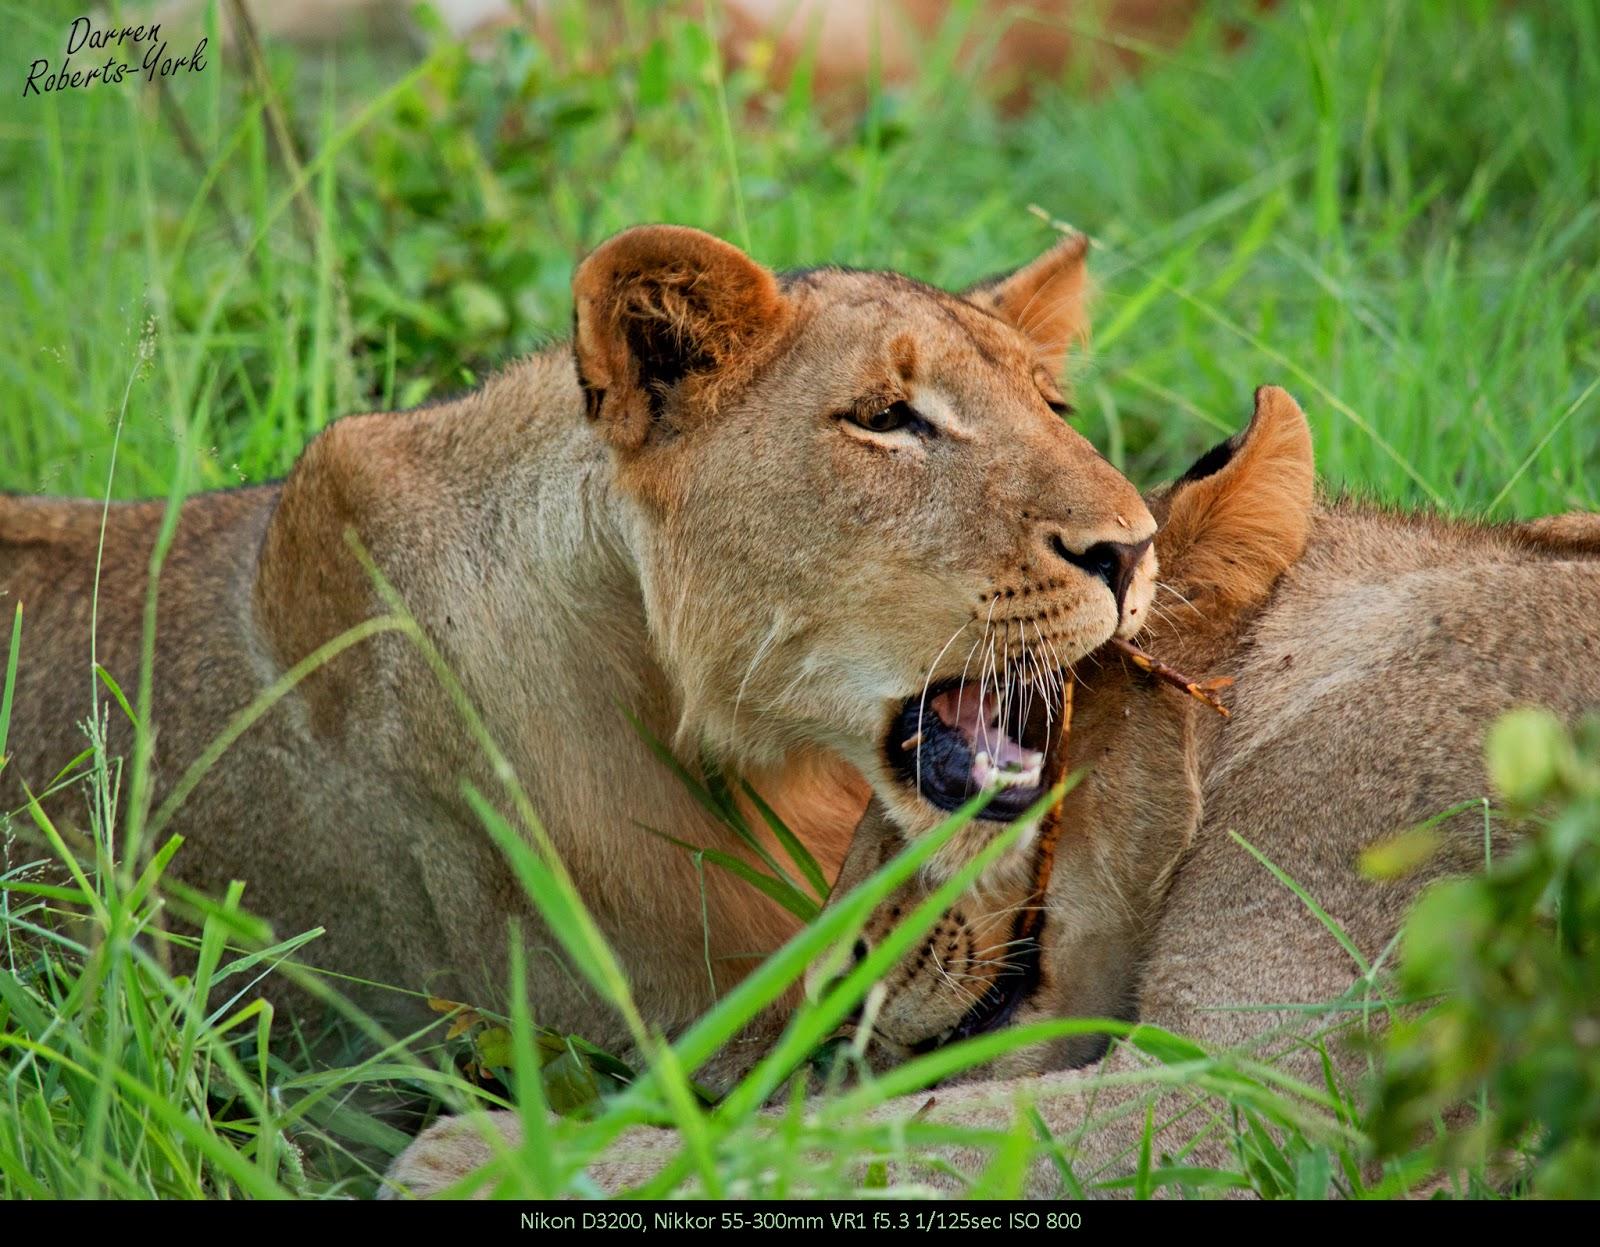 Honey badger vs lion testicles - photo#28